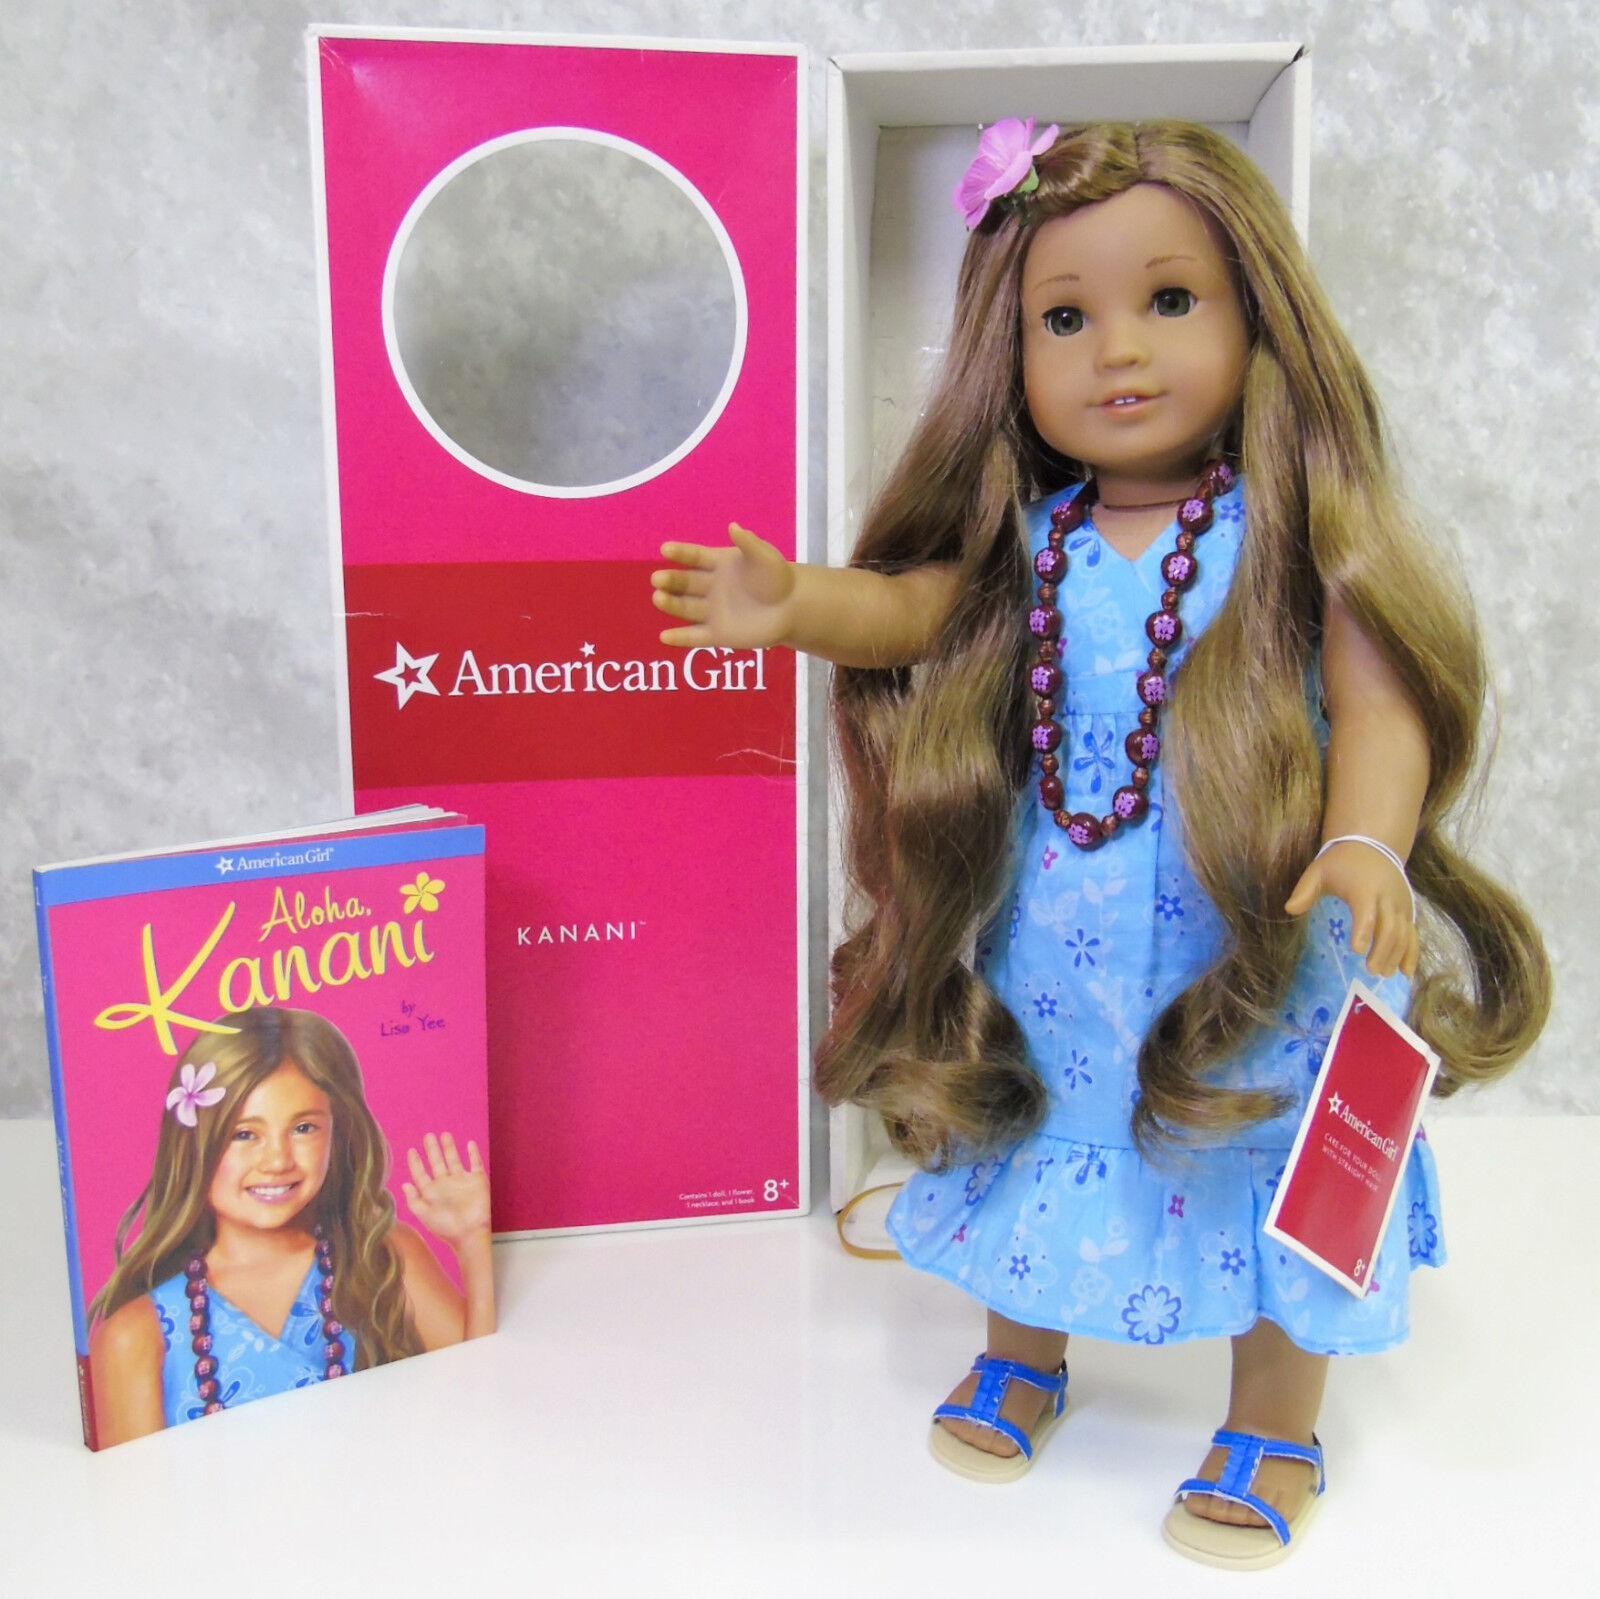 American Girl 18 Kanani Muñeca con Conocer Conjunto Collar la Zapatos Libro Ag